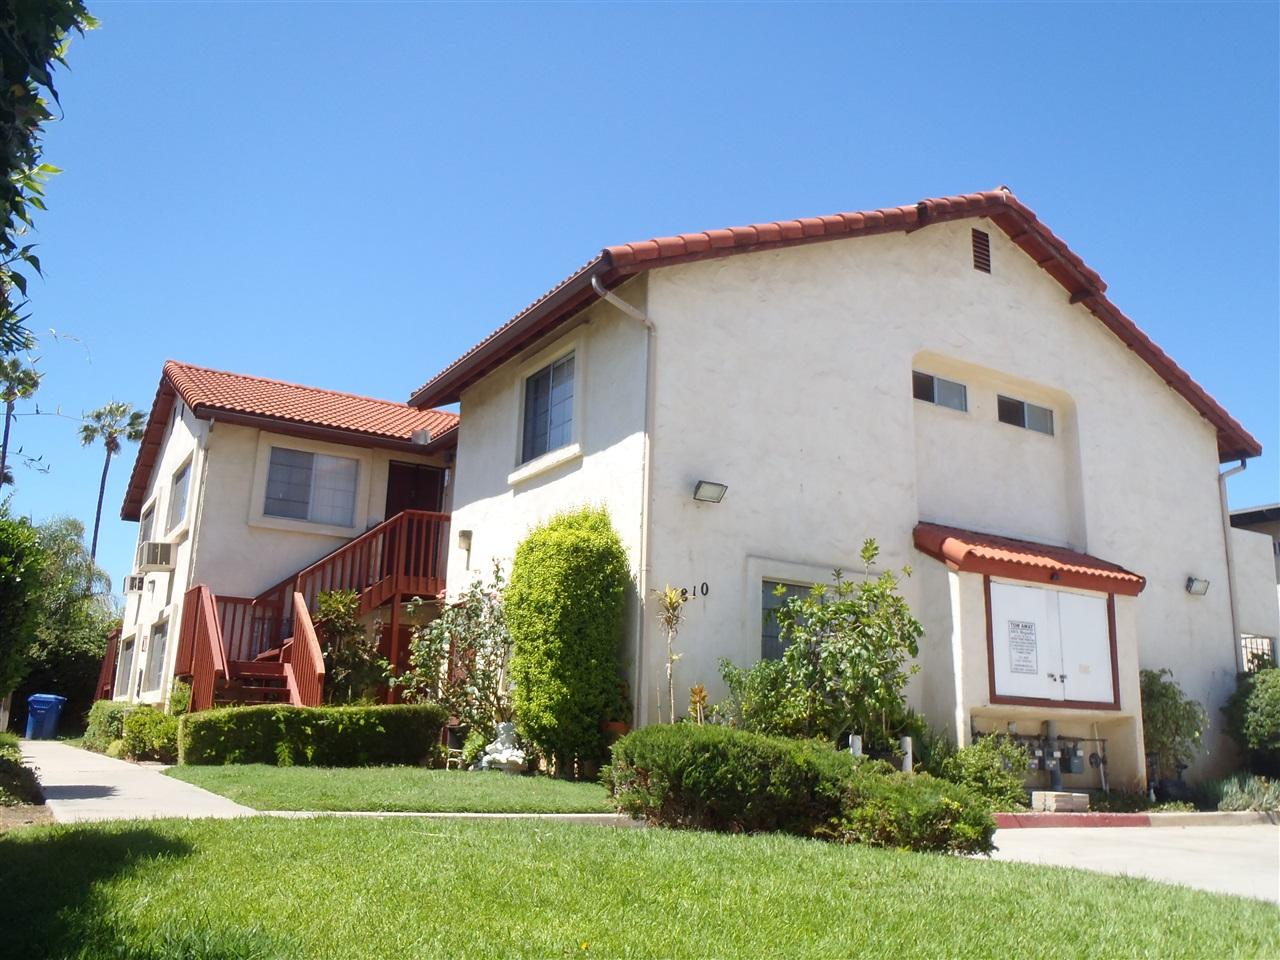 810 S Magnolia Ave -  El Cajon, CA 92020